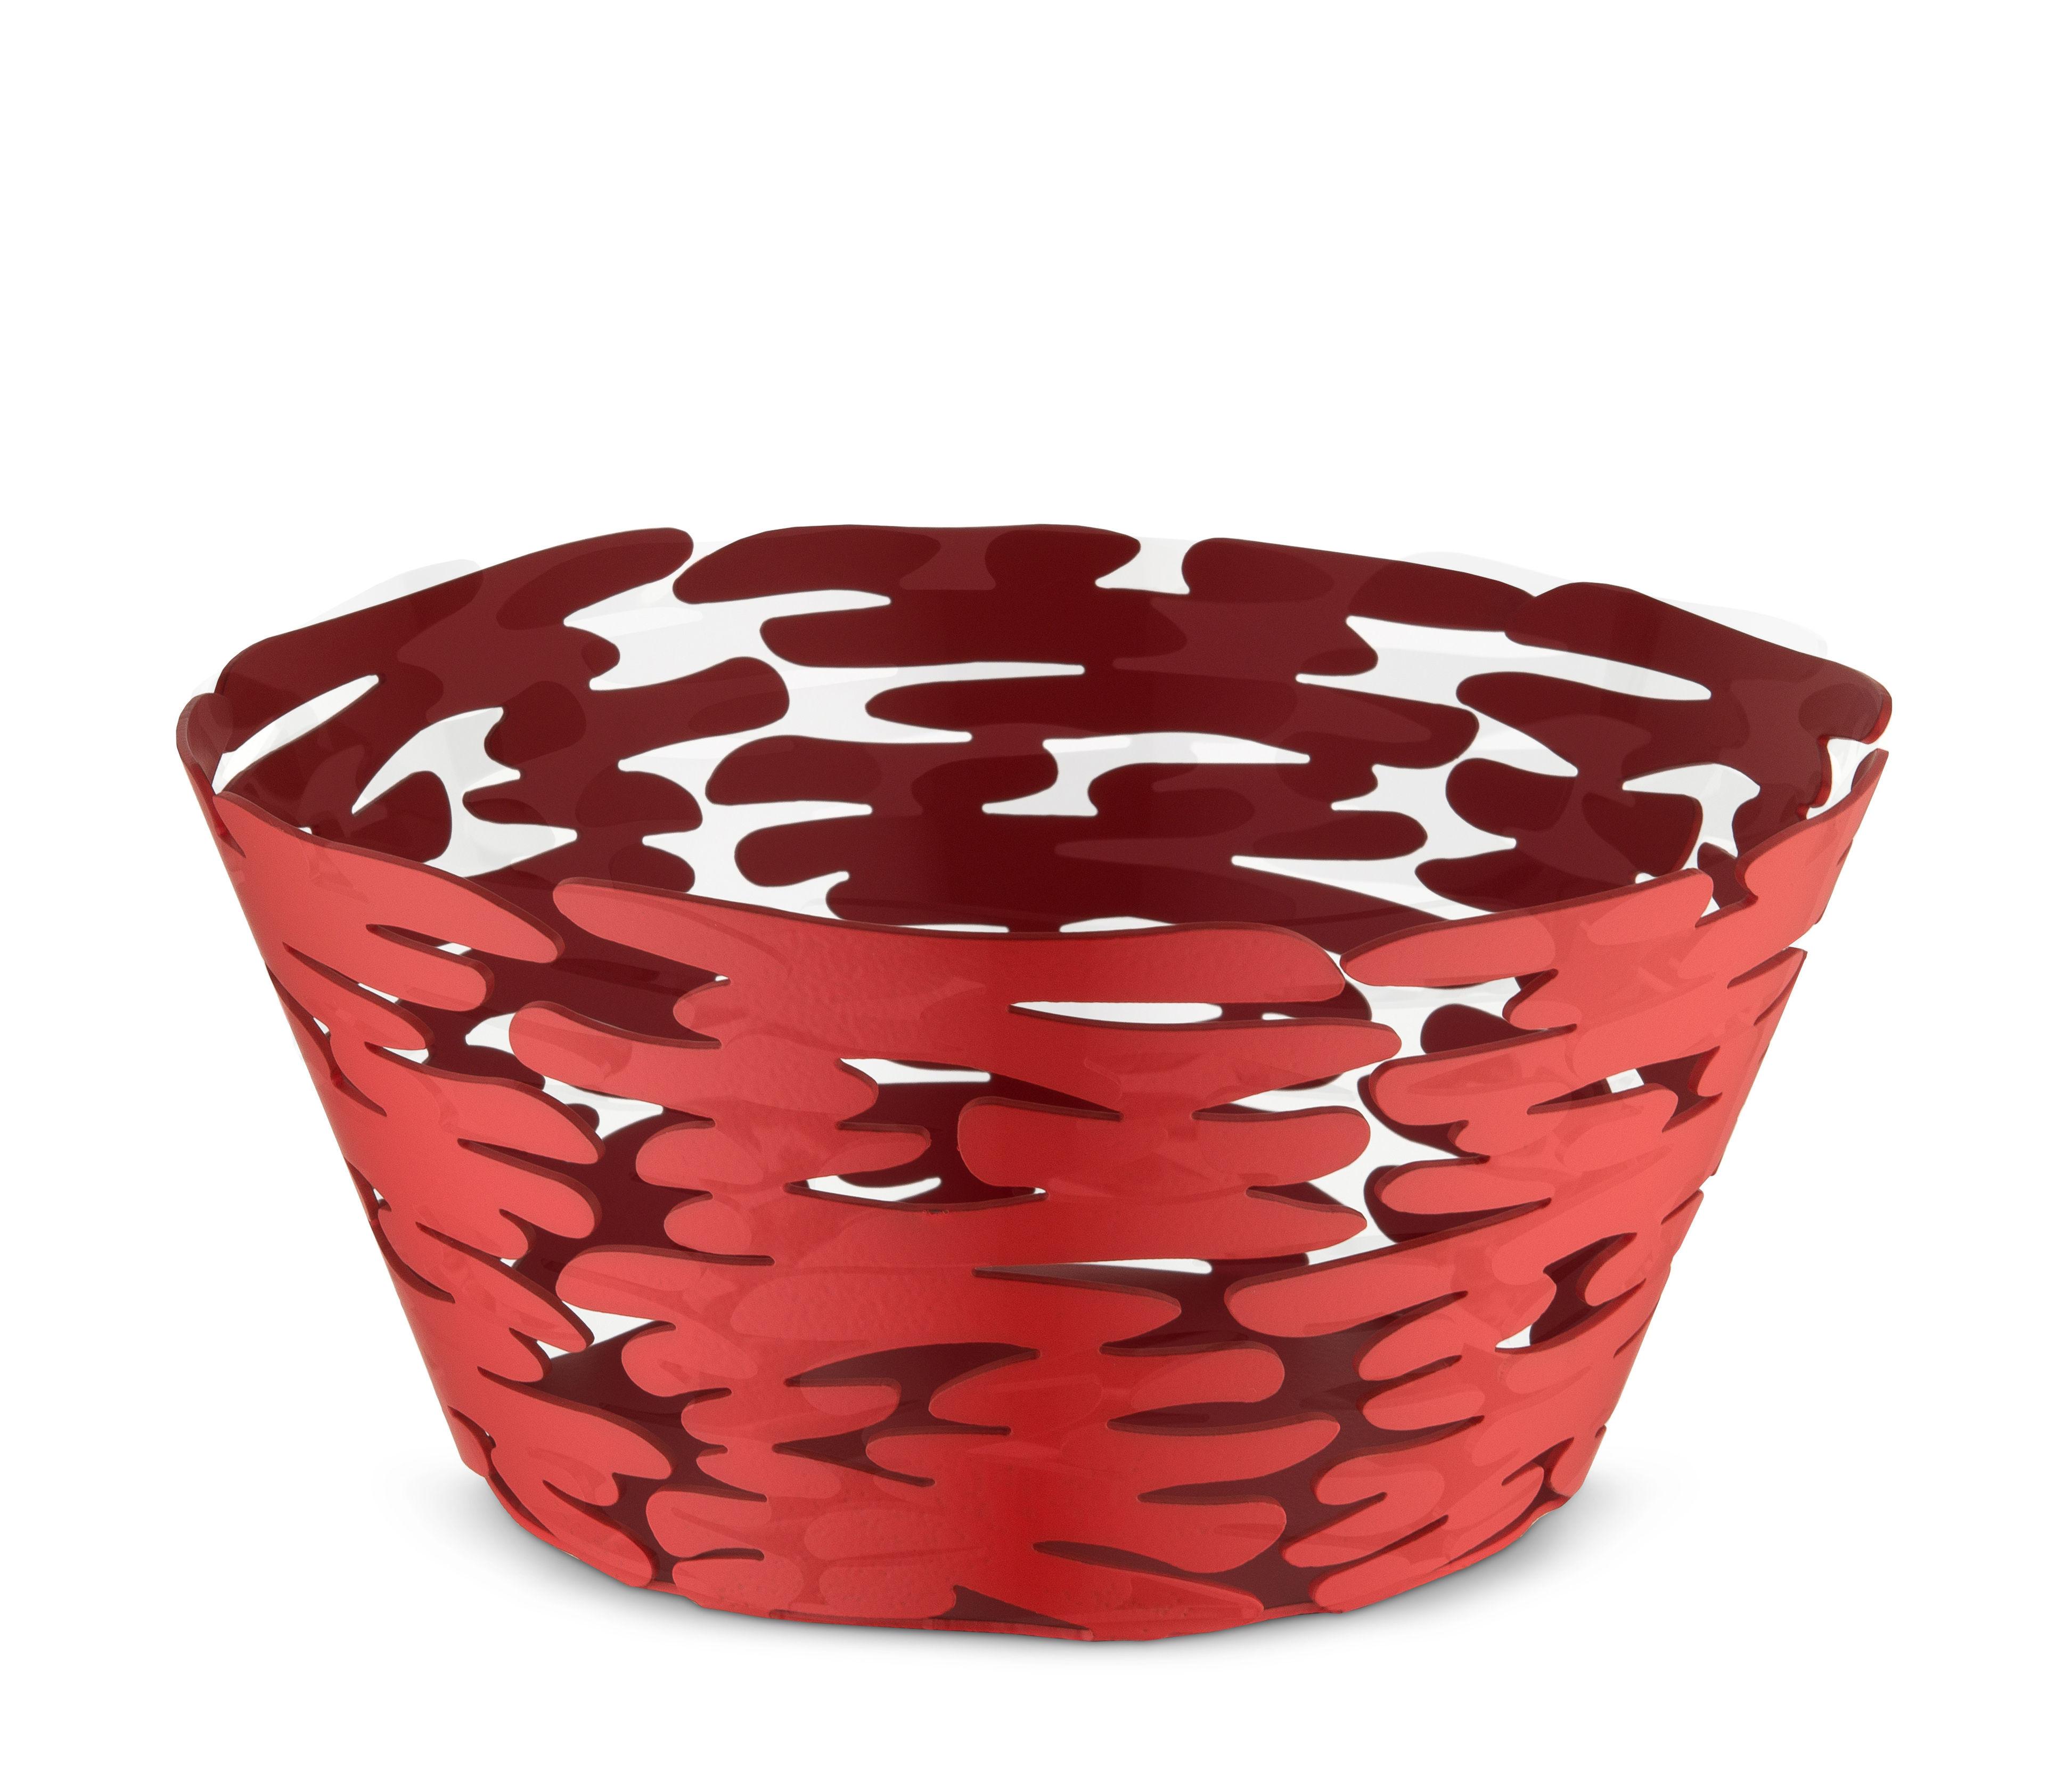 Arts de la table - Corbeilles, centres de table - Corbeille Barket / Ø 21 cm - Acier - Alessi - Rouge - Acier verni